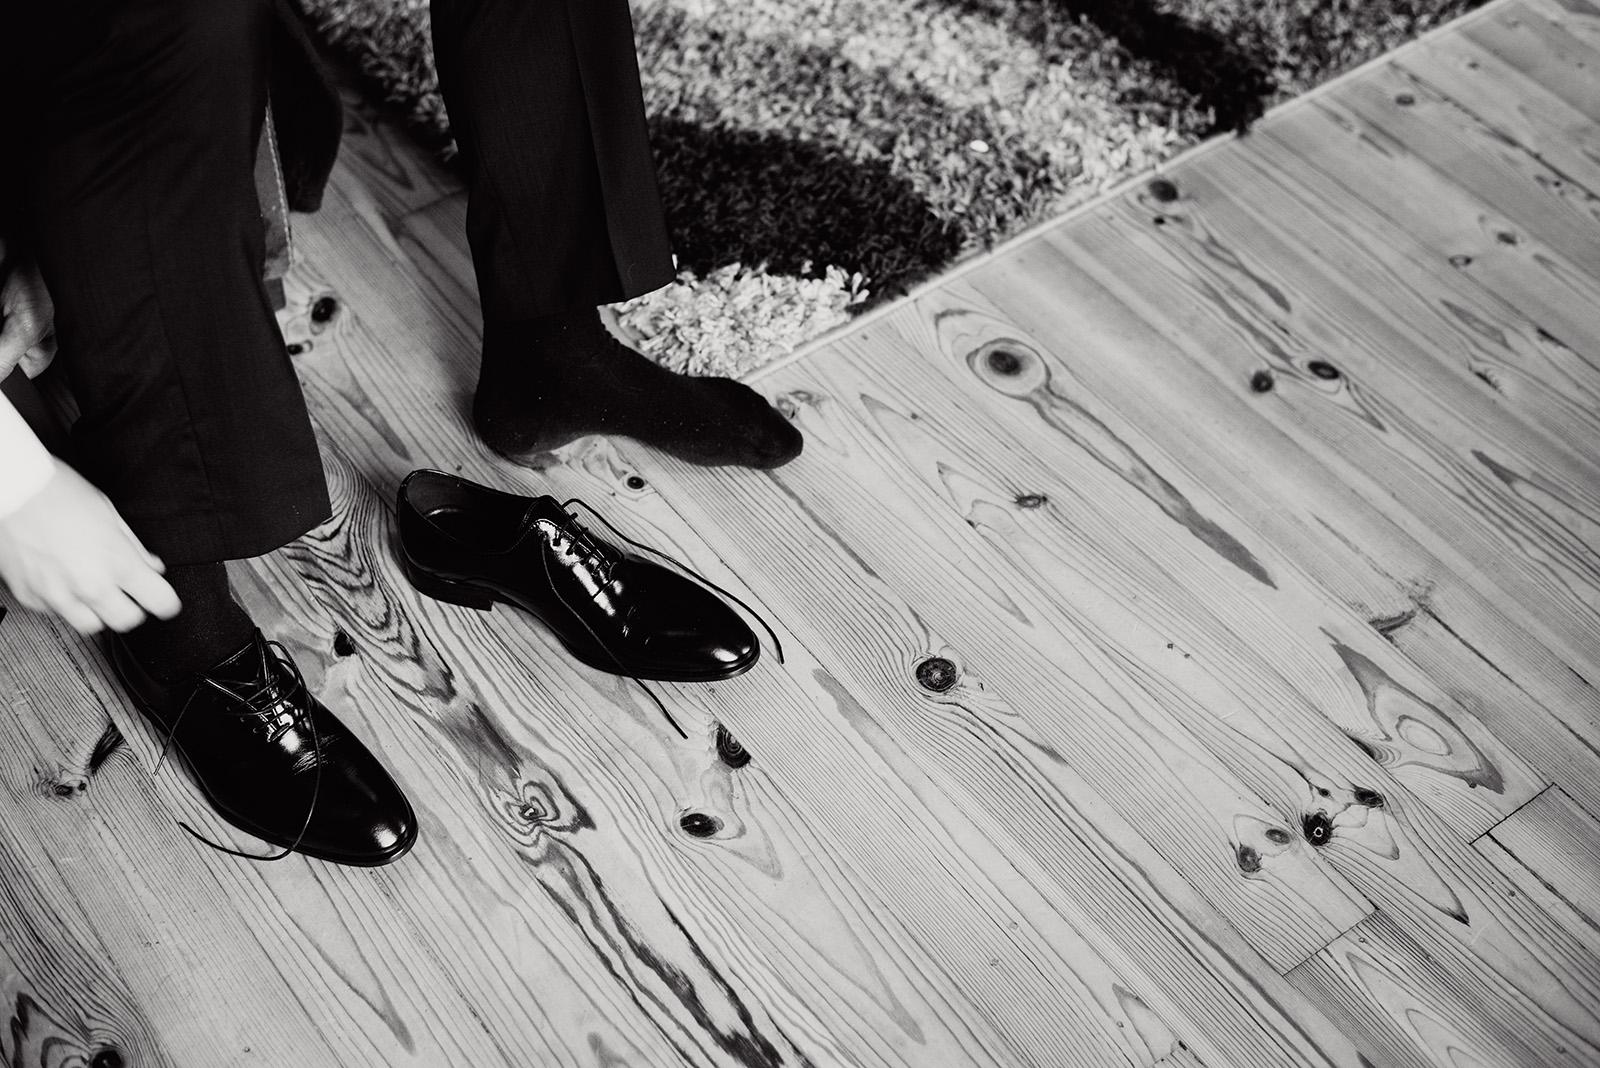 naturalny fotografia slubna - przygotowania pana mlodego - buty